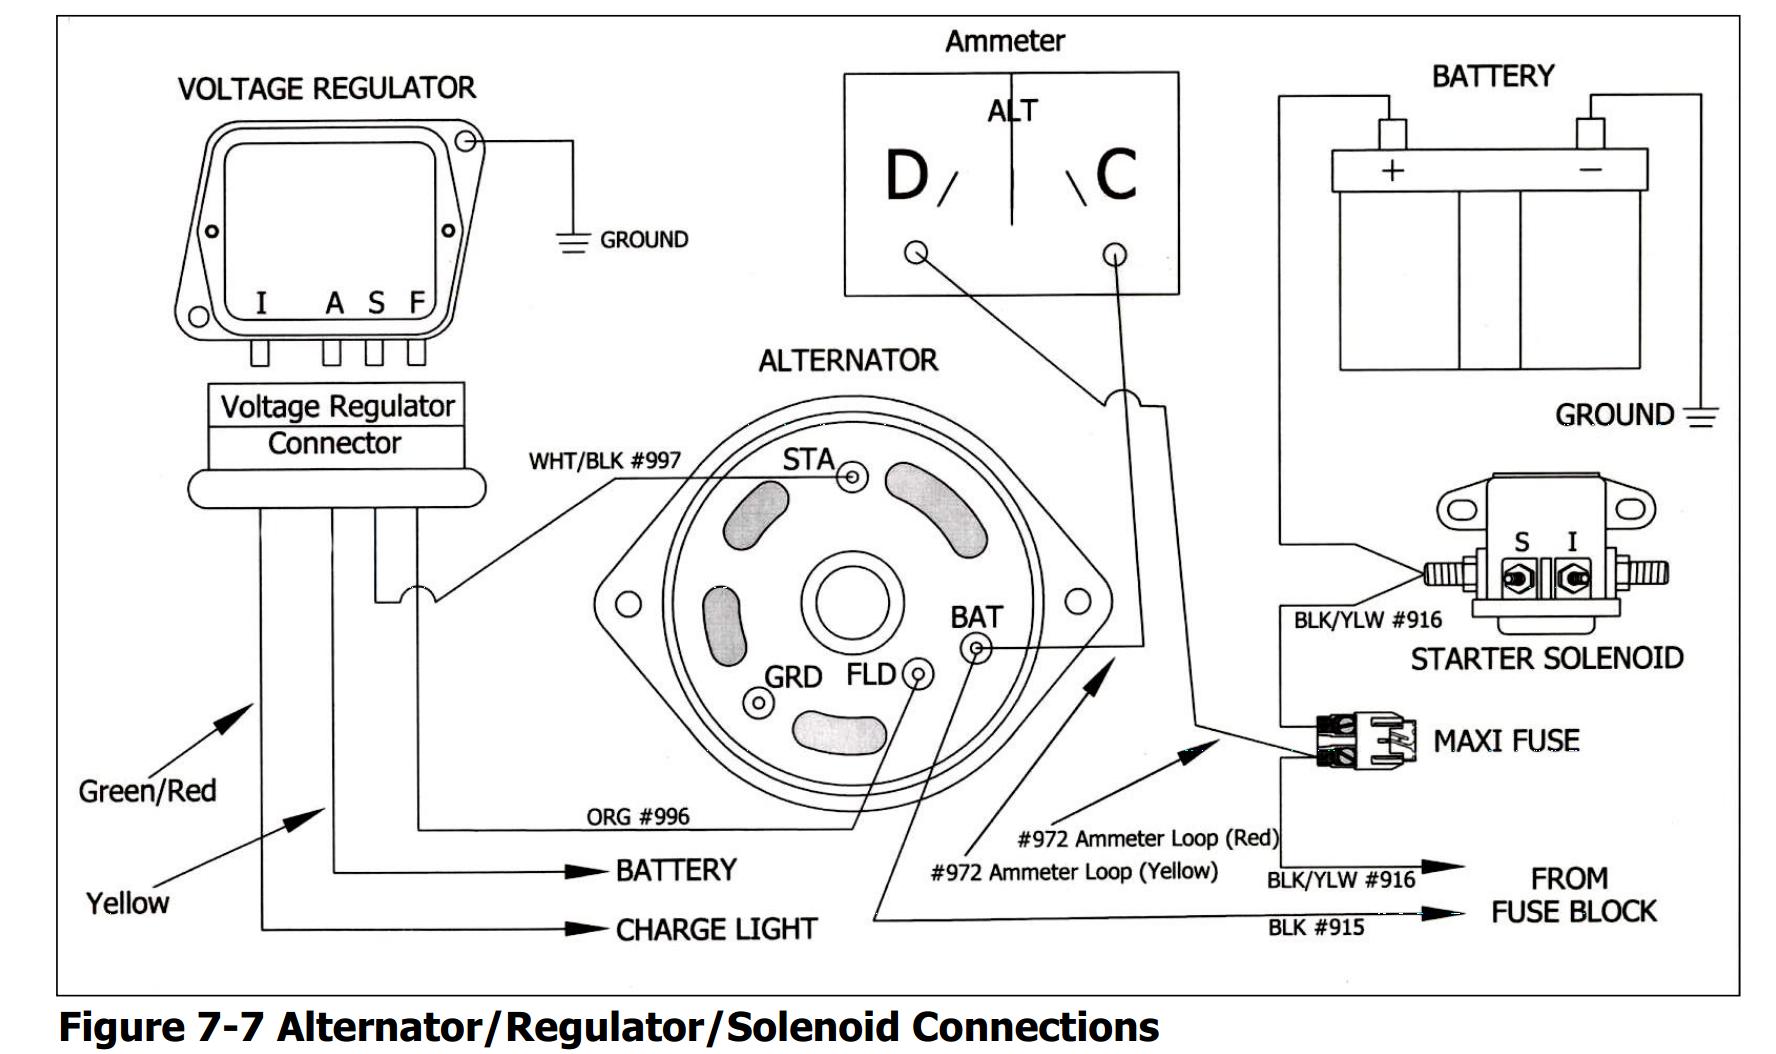 vr600 voltage regulator wiring diagram wiring libraryski doo voltage regulator diagram basic guide wiring diagram  [ 1776 x 1054 Pixel ]